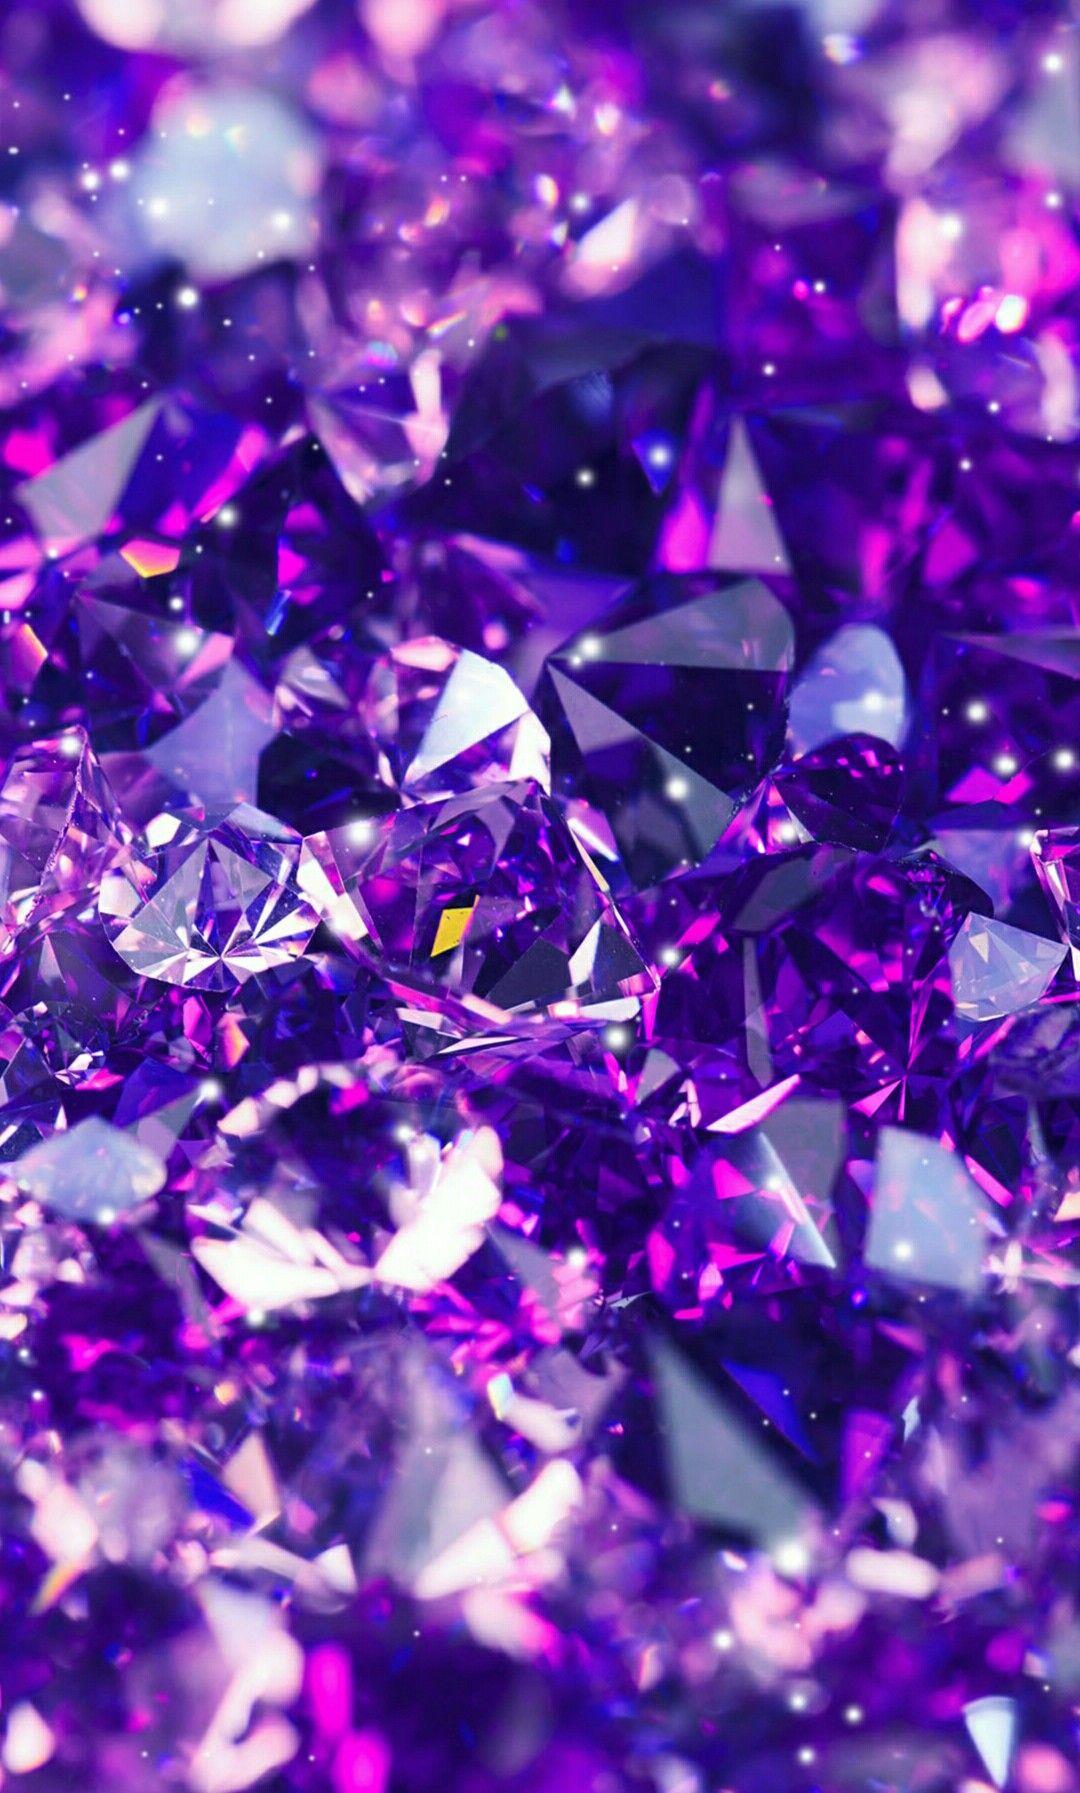 purple // gems Papel de parede galáxia roxa, Wallpapers